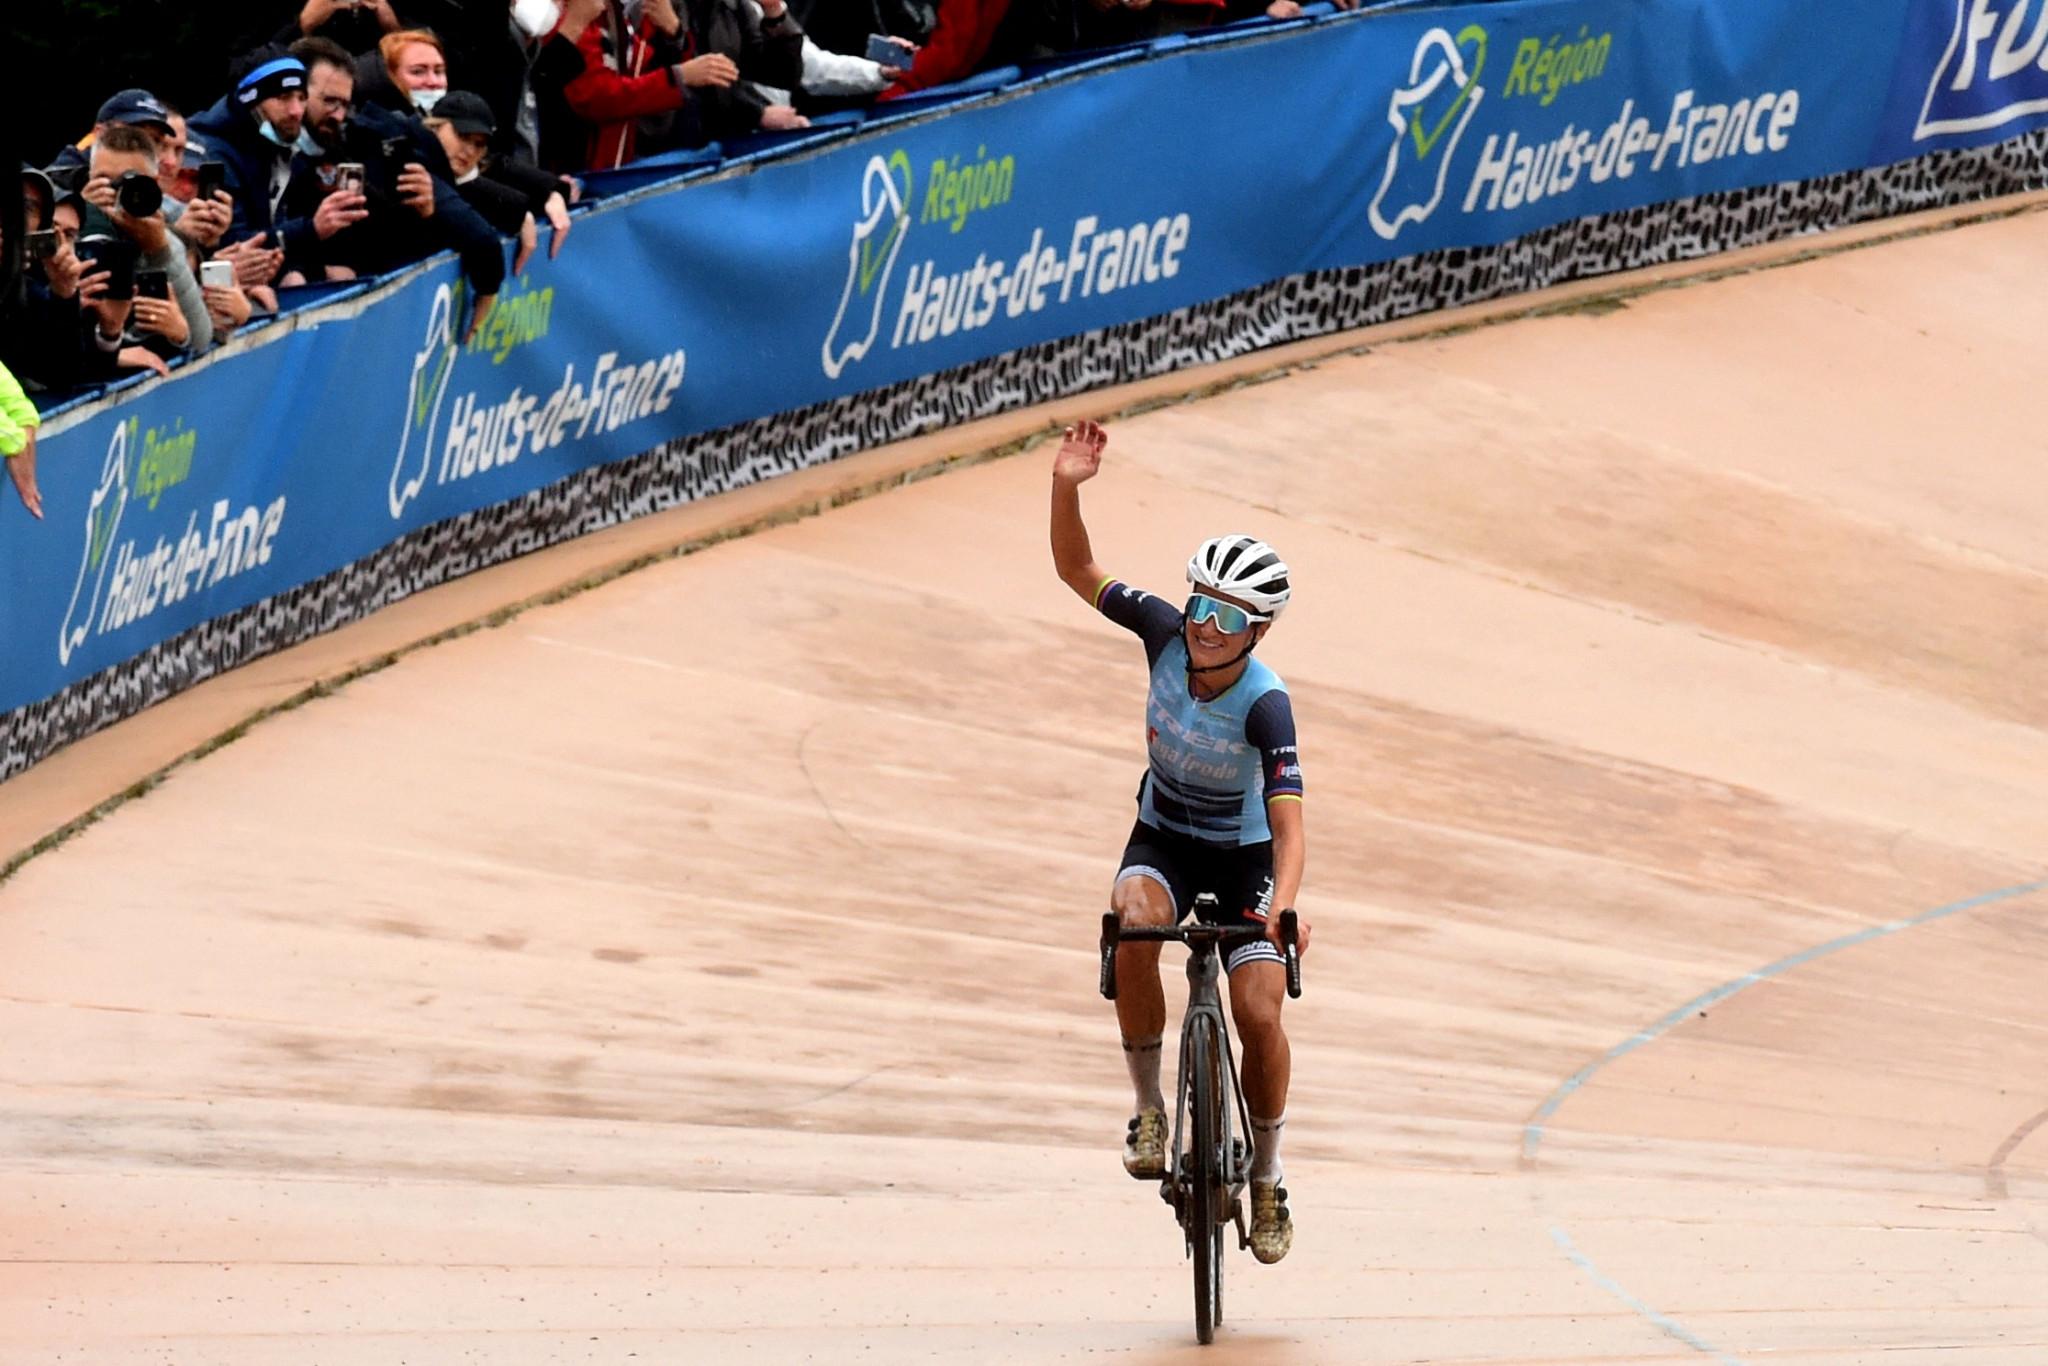 Emotional Deignan triumphs in first women's Paris-Roubaix race